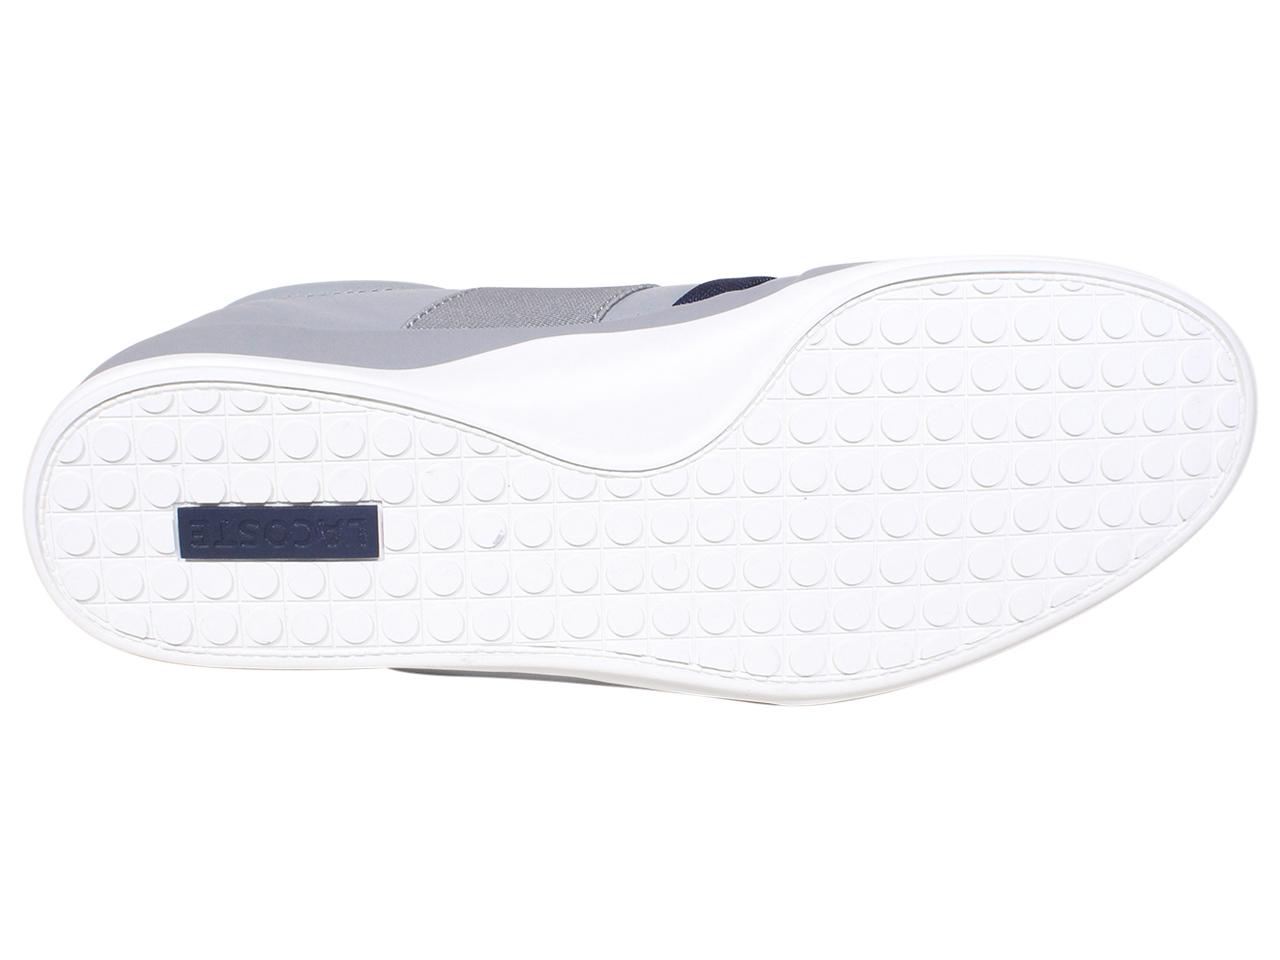 Lacoste-Misano-Elastic-318-Sneakers-Men-039-s-Low-Top-Shoes thumbnail 14